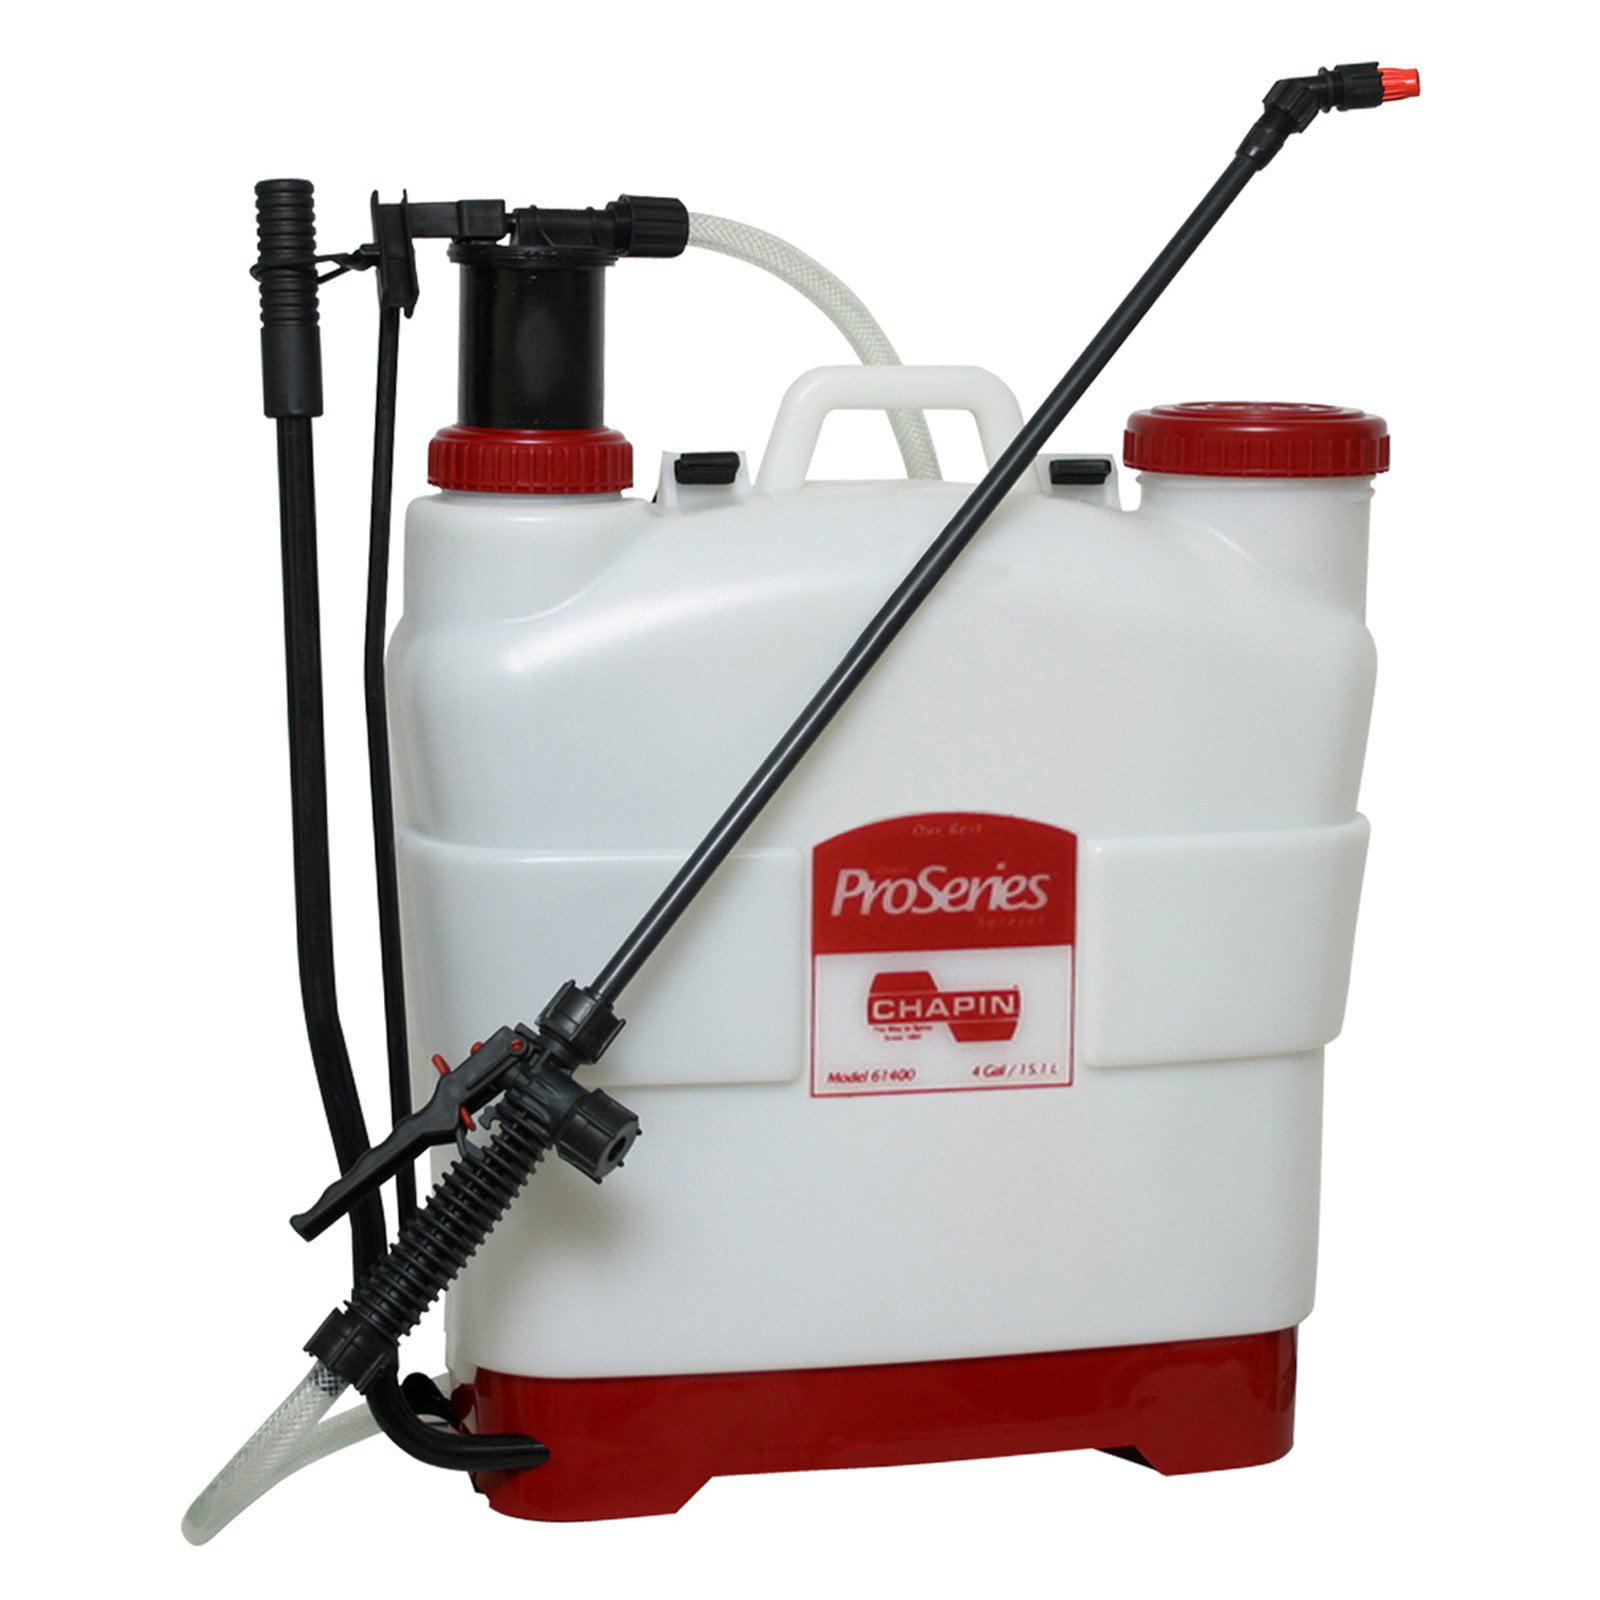 Chapin Sprayers 61500 Backpack Sprayer